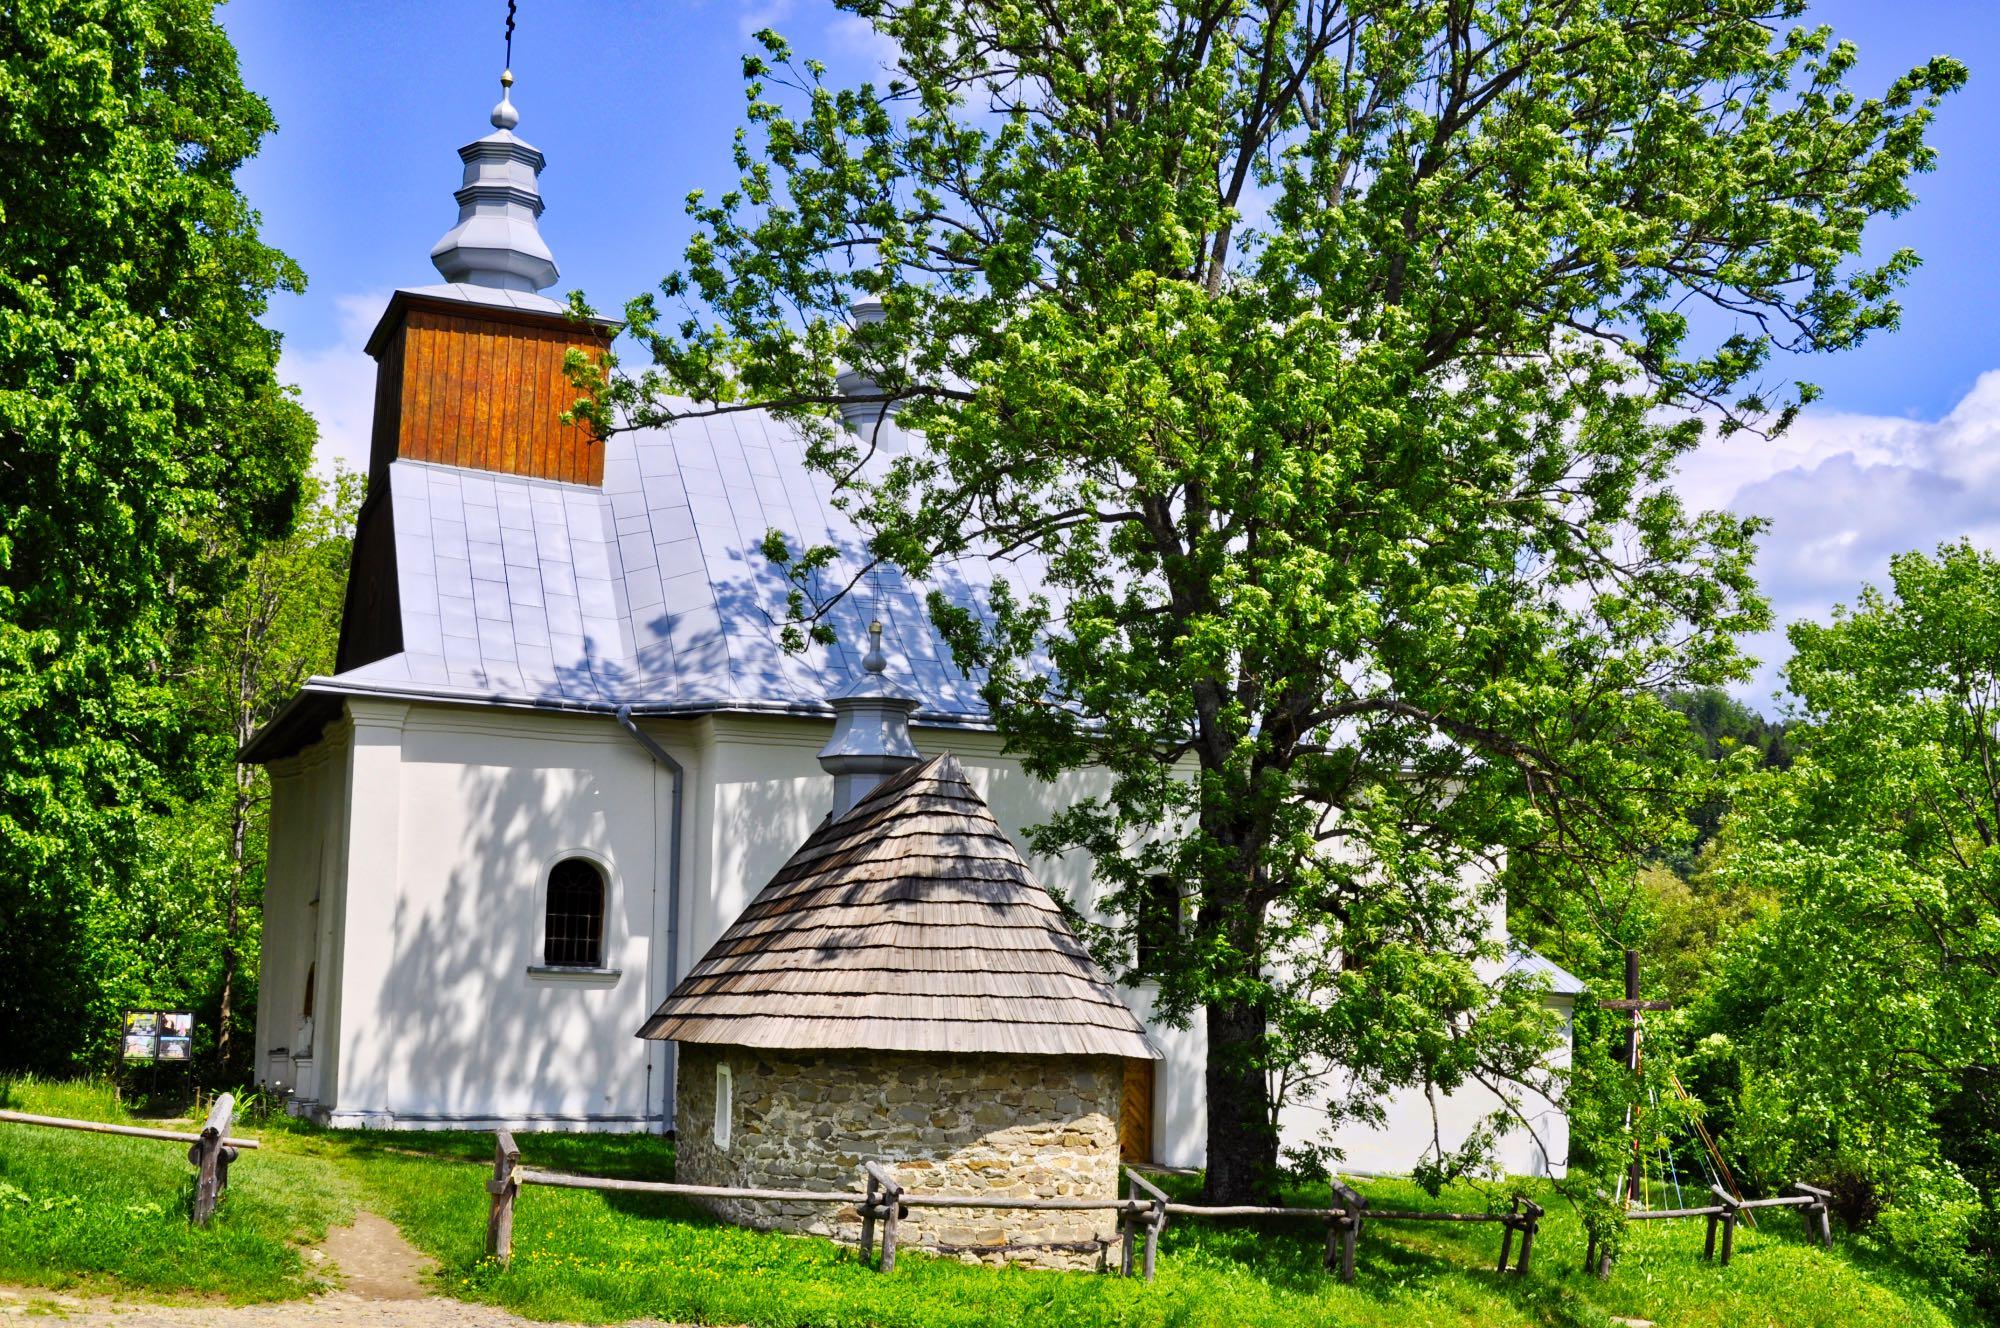 Cerkiew w Łopience / fot. Lidia Tul-Chmielewska